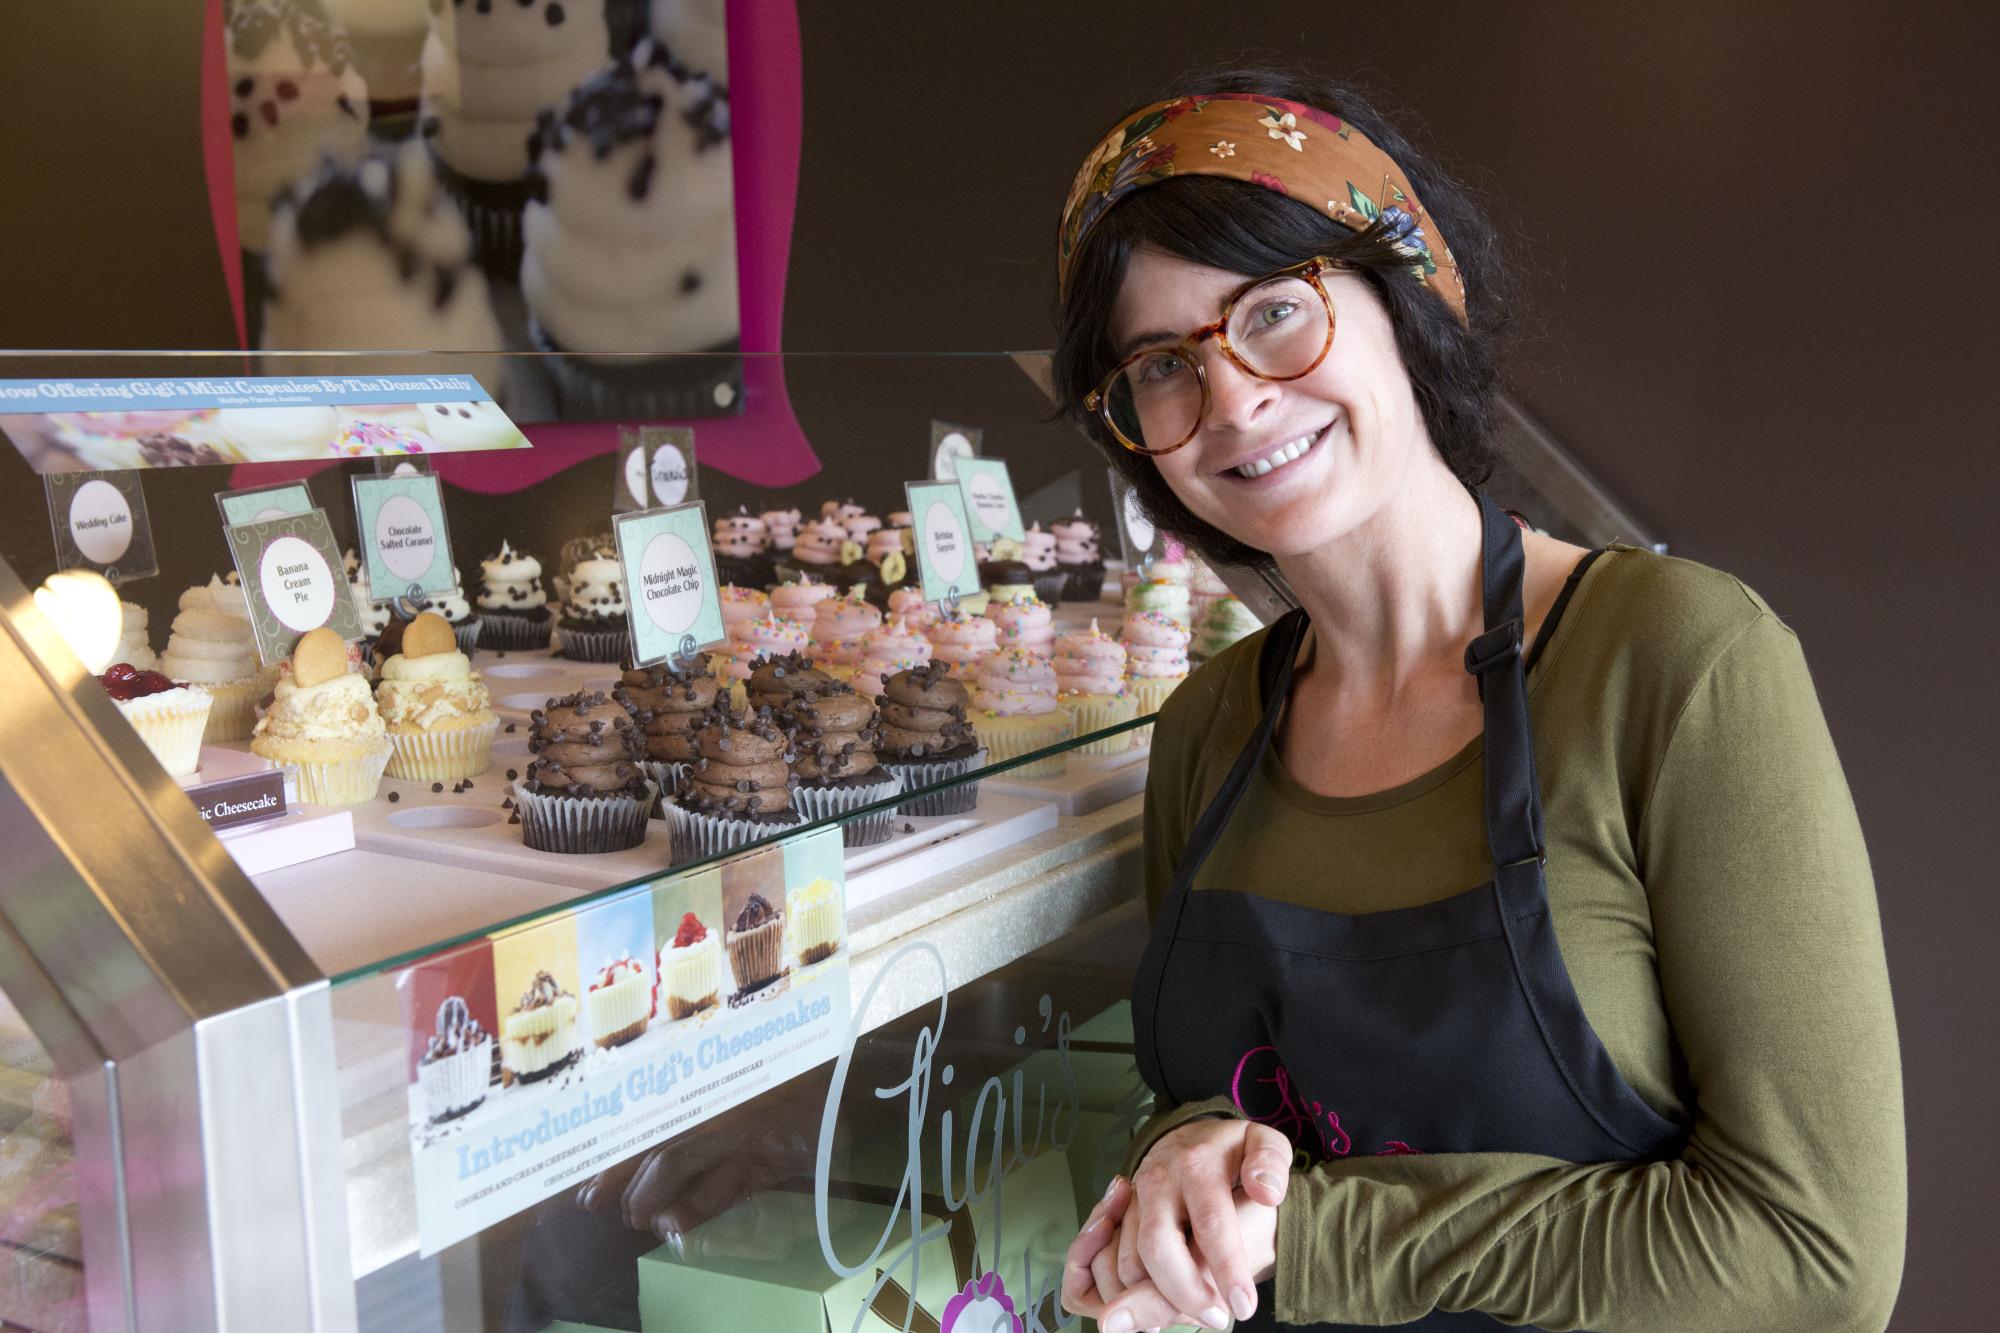 Posing next to her beautiful cupcake creations